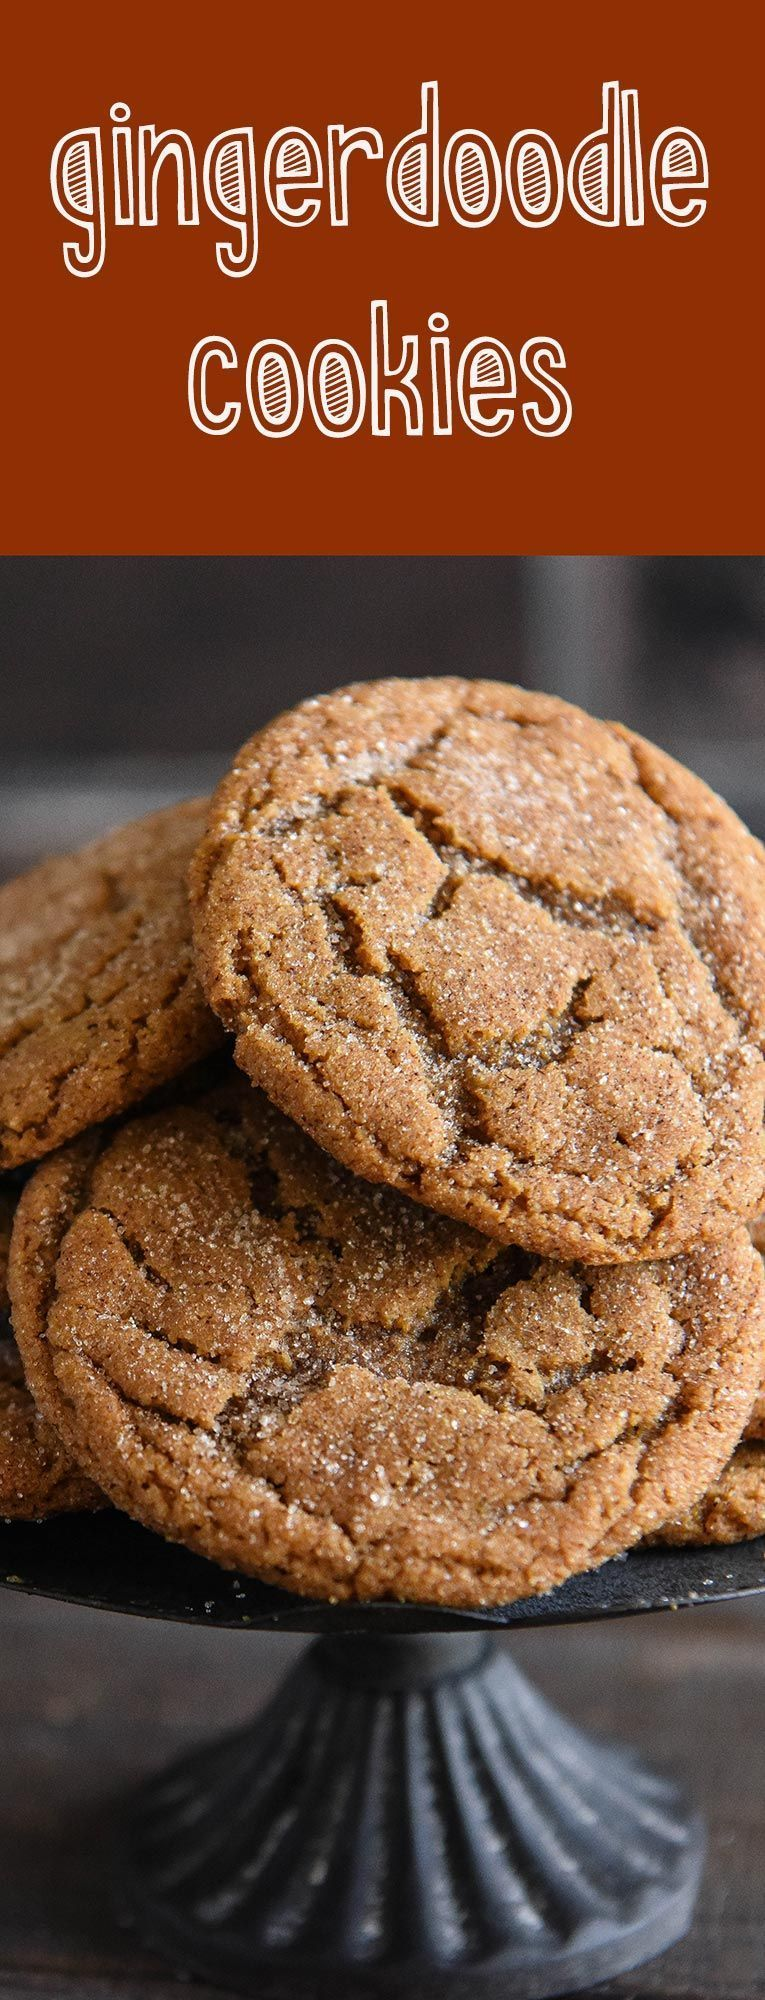 Gingerdoodle Cookies | Dixie Crystals